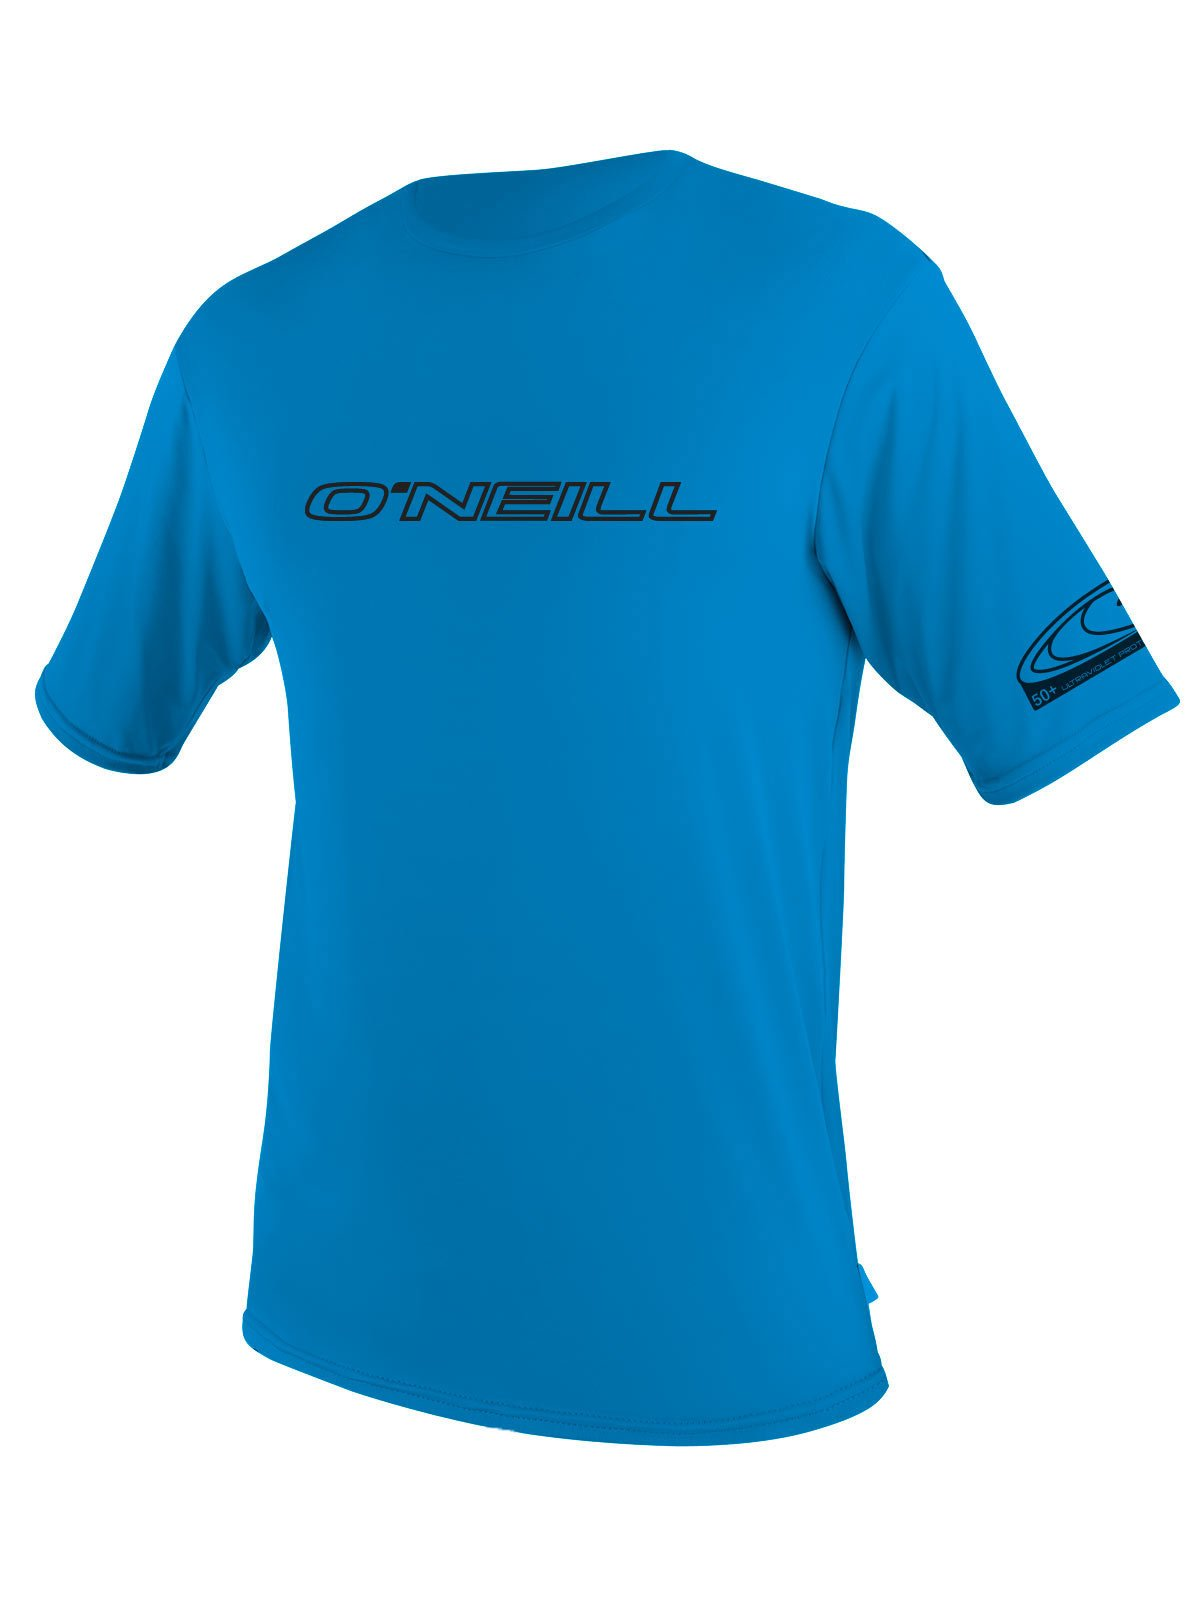 O'Neill Men's Basic Skins Rash Tee S Brite blue (3402IS)